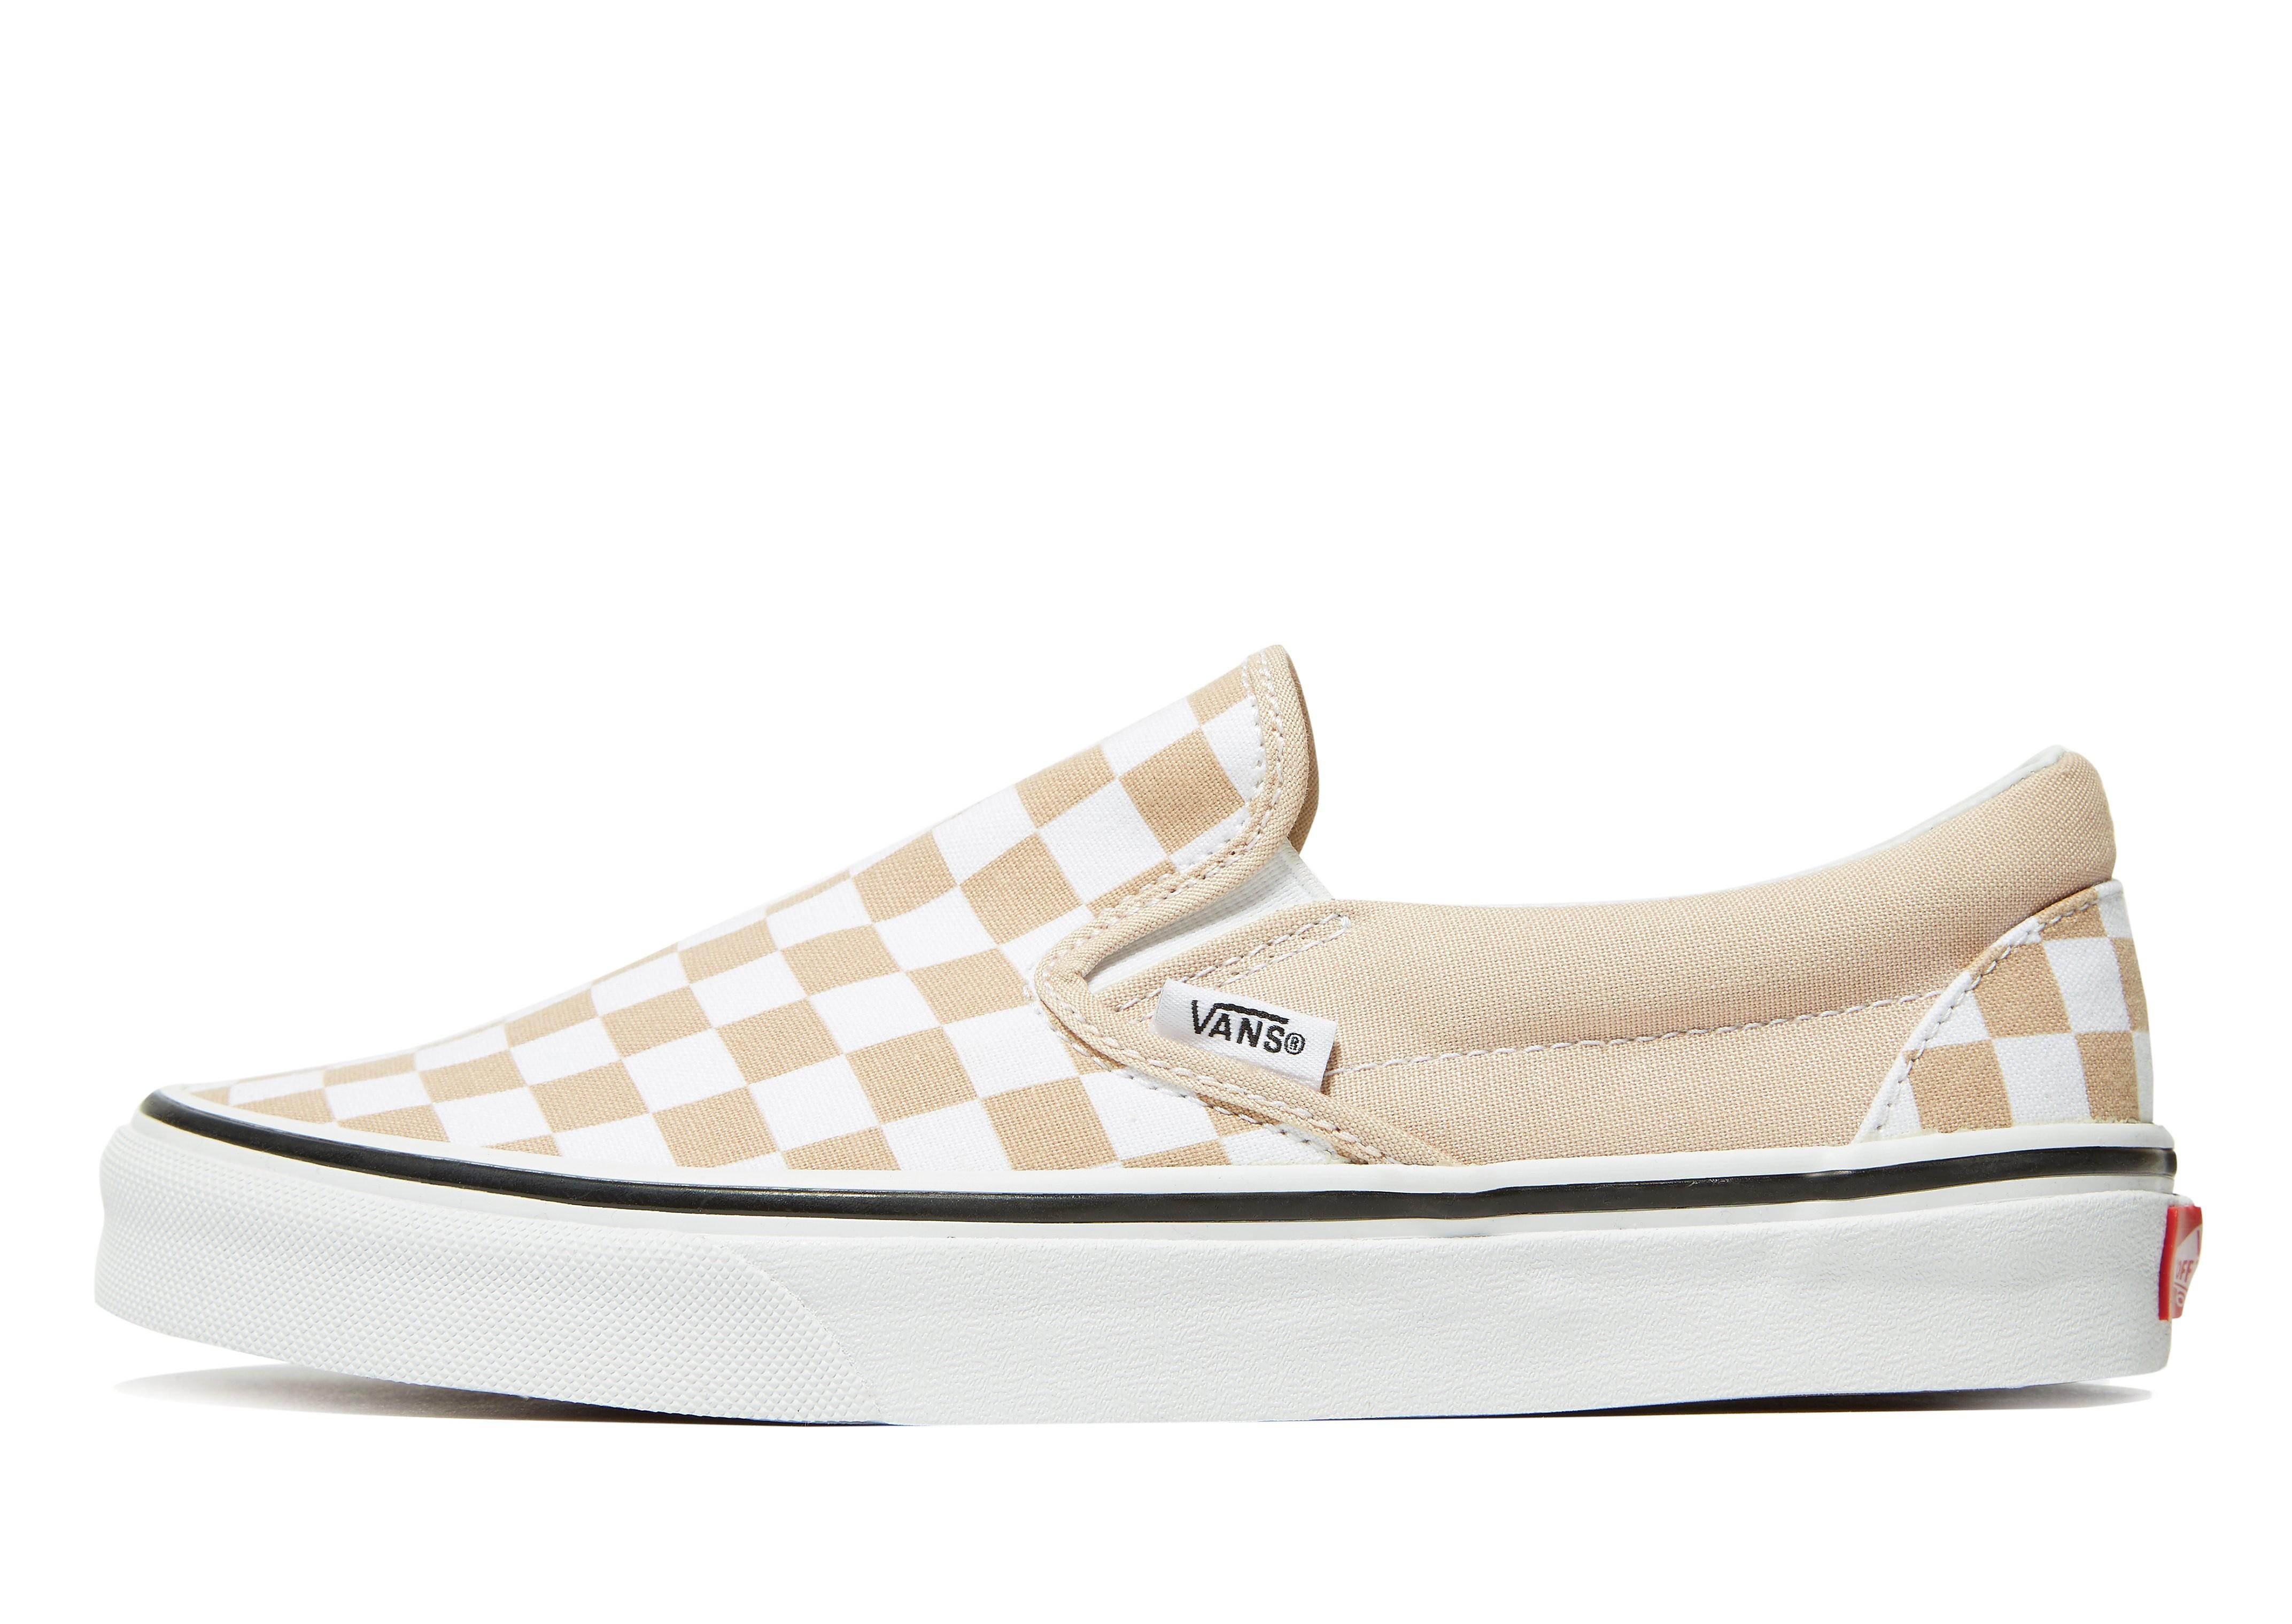 Vans Classic Slip On Women's